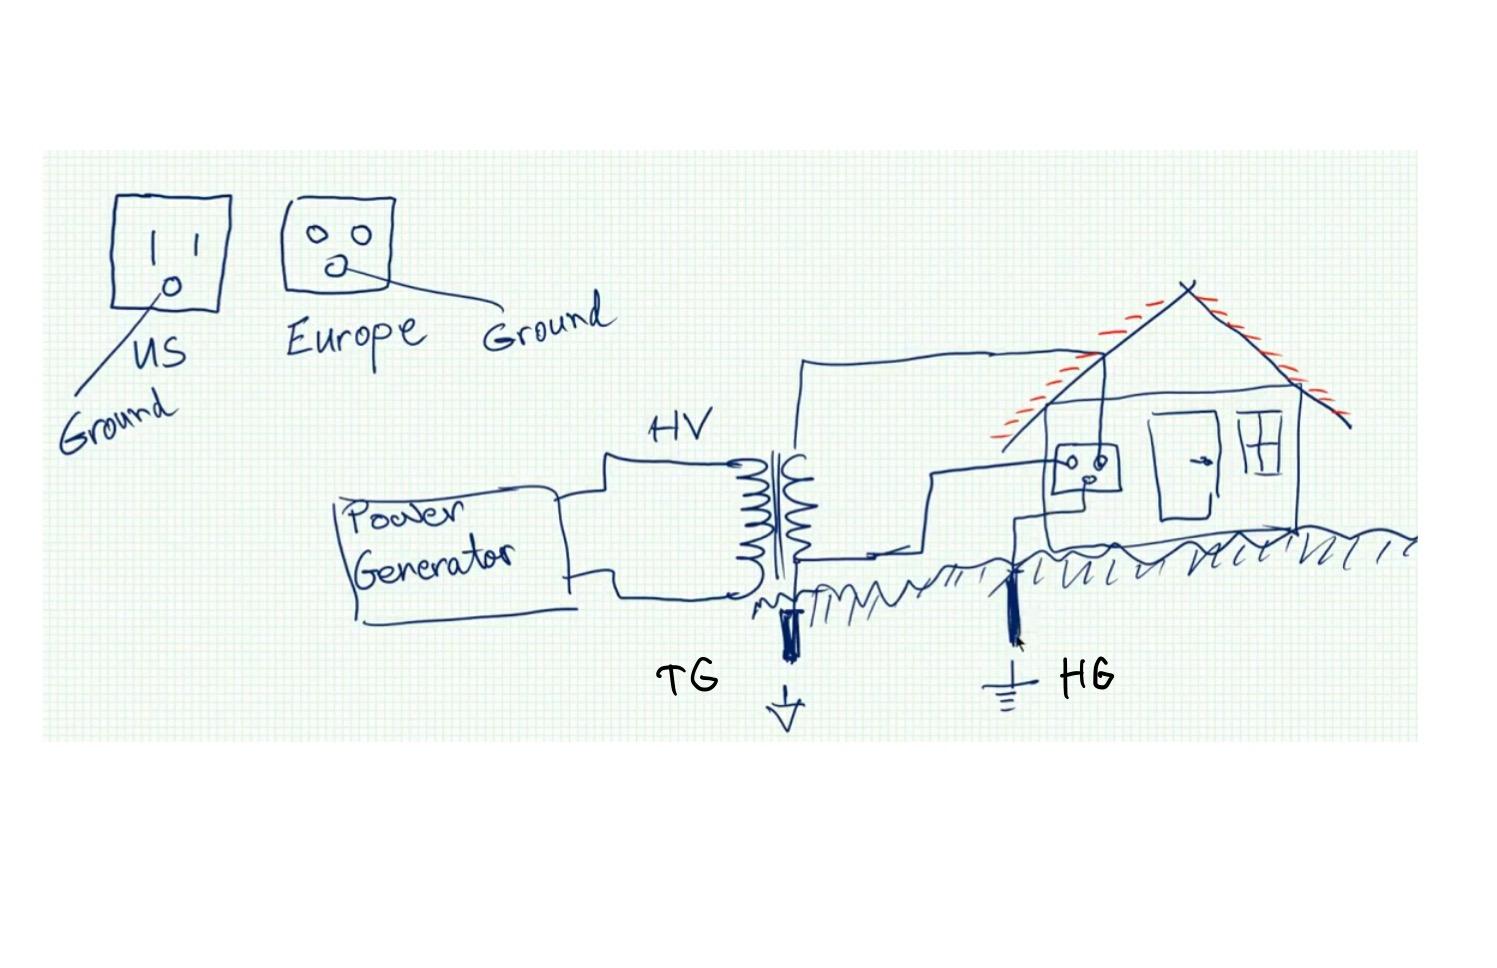 hight resolution of european electrical transformer diagram wiring diagram blog european electrical transformer diagram